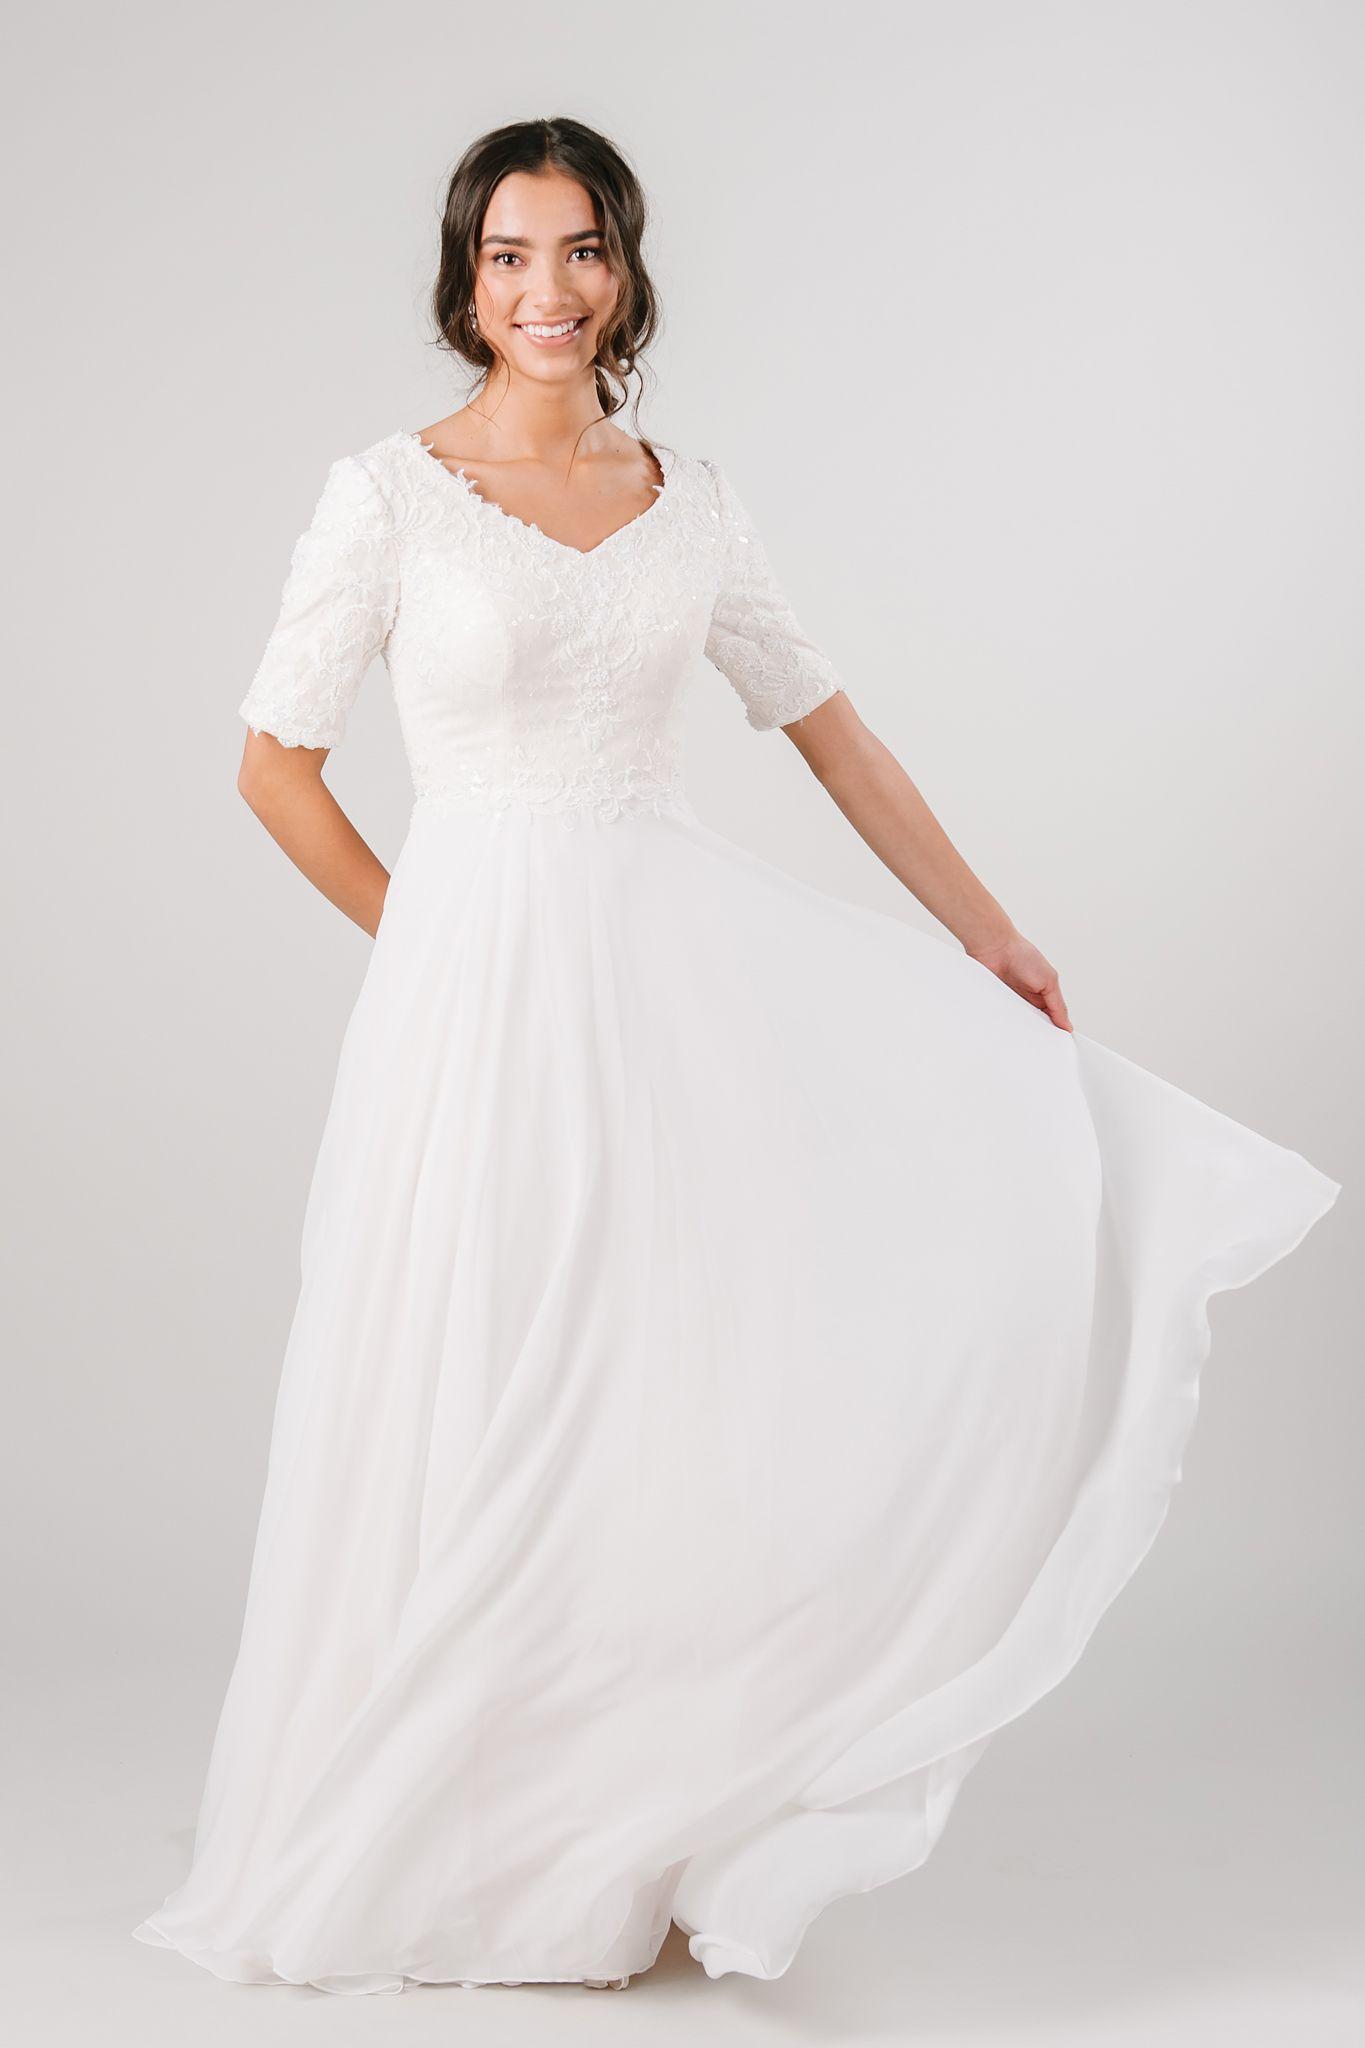 Ferdinand Petite Wedding Dress Modest Lace Wedding Dresses Wedding Dress Styles Chart [ 2048 x 1365 Pixel ]